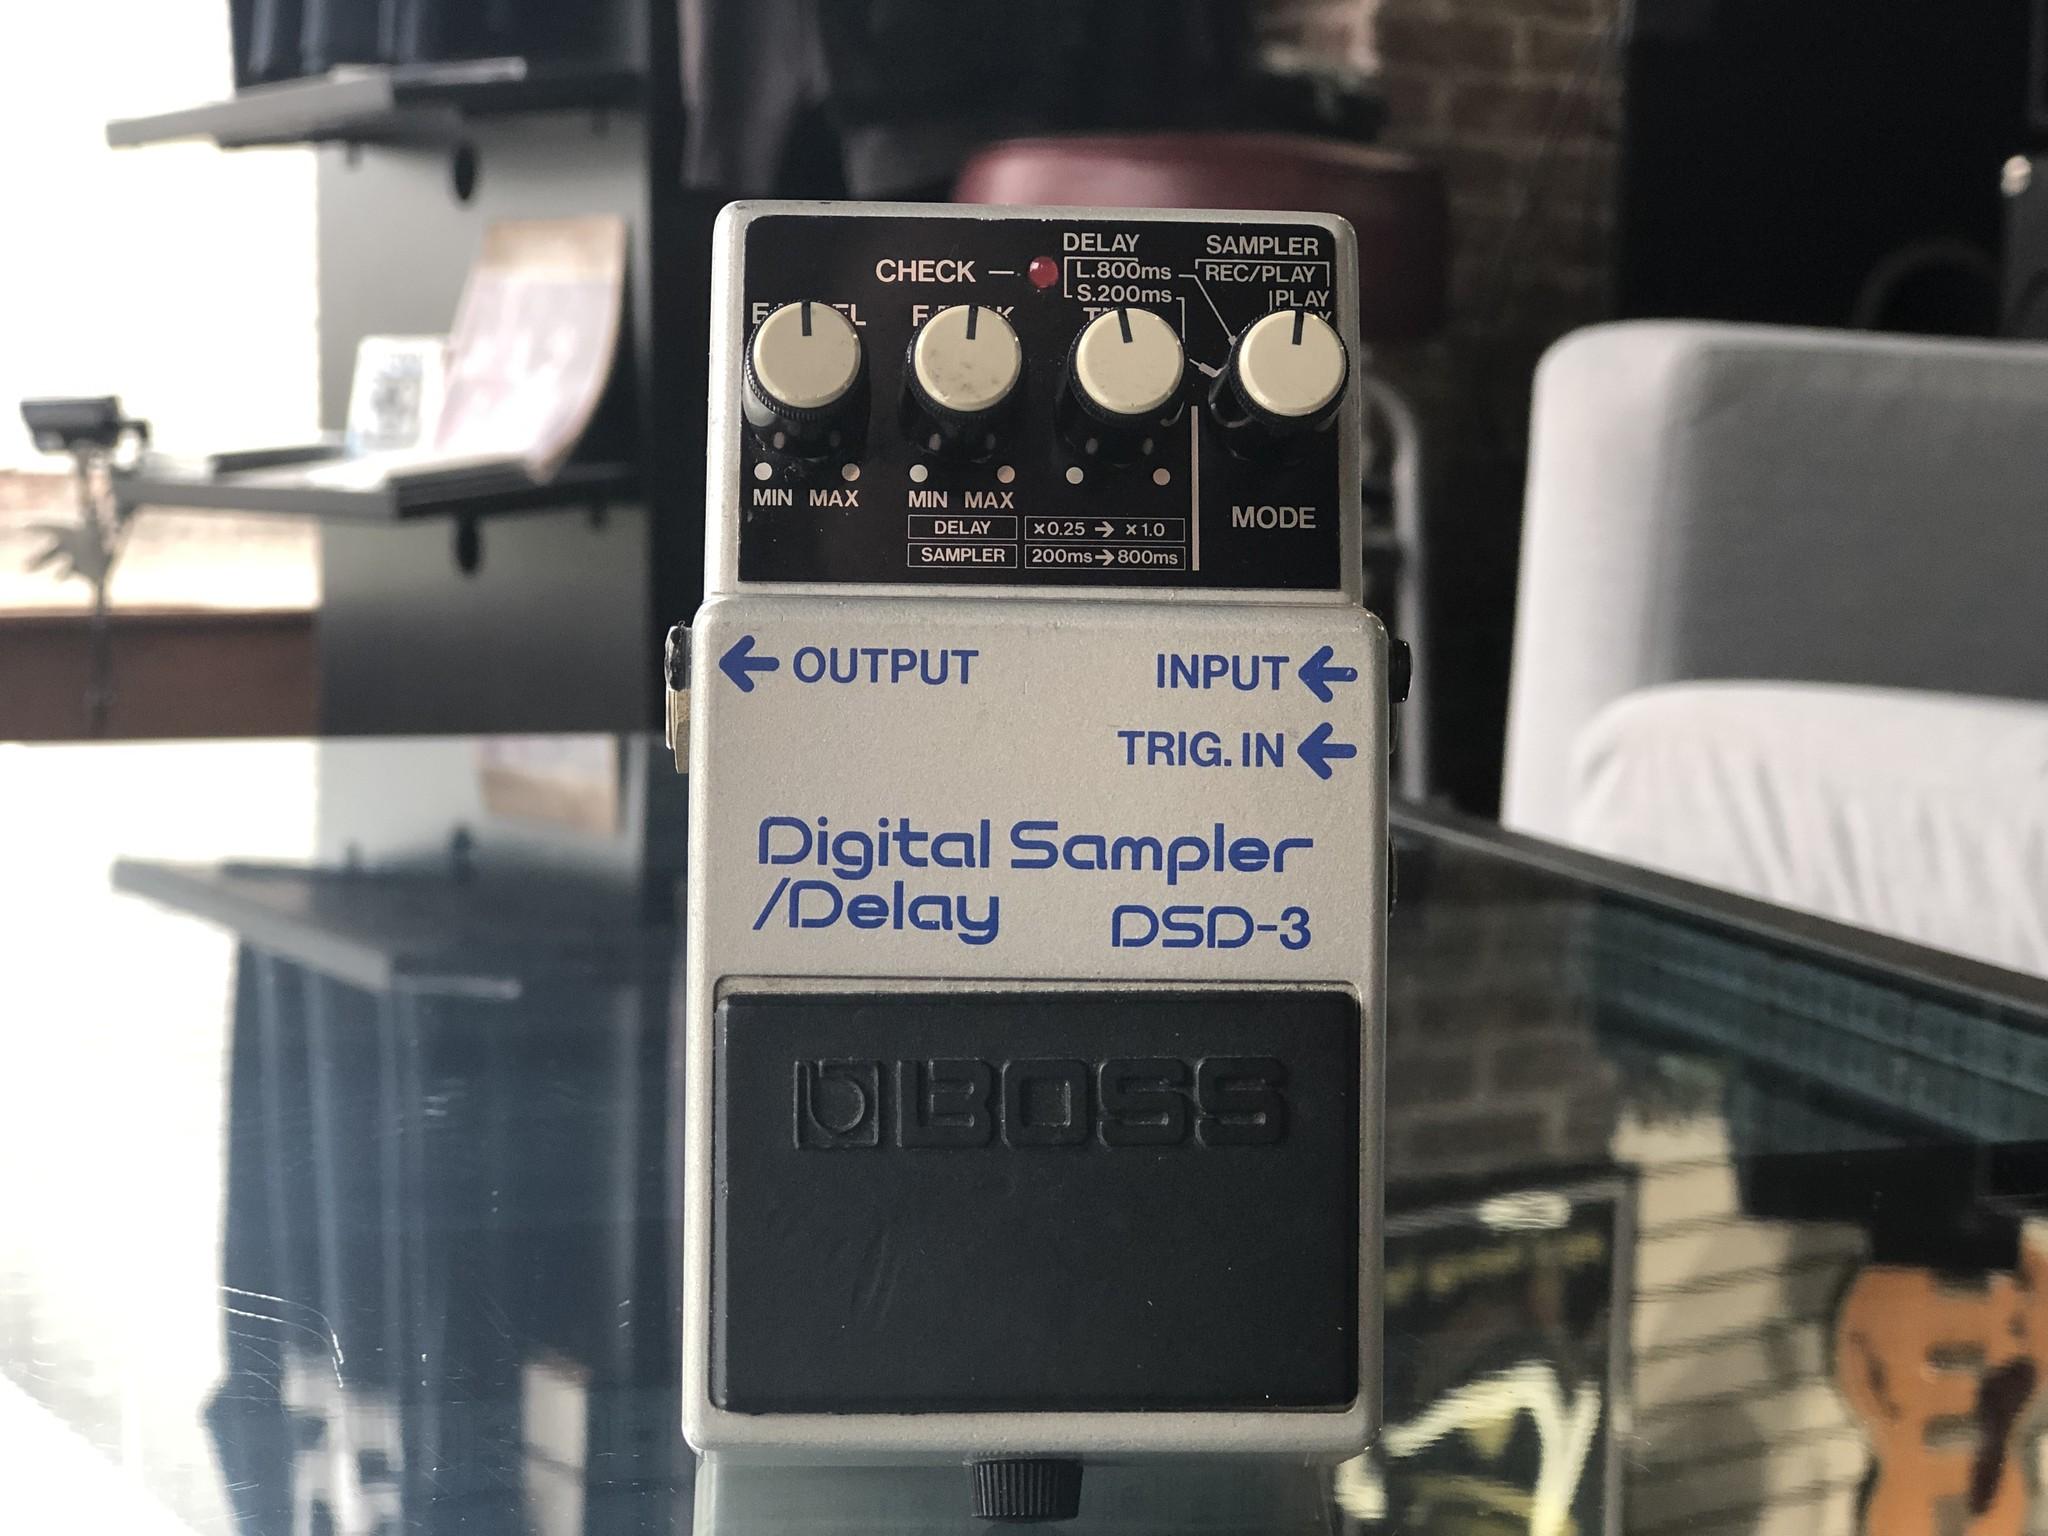 Boss DSD-3 Digital Sampler Delay Made in Japan-1